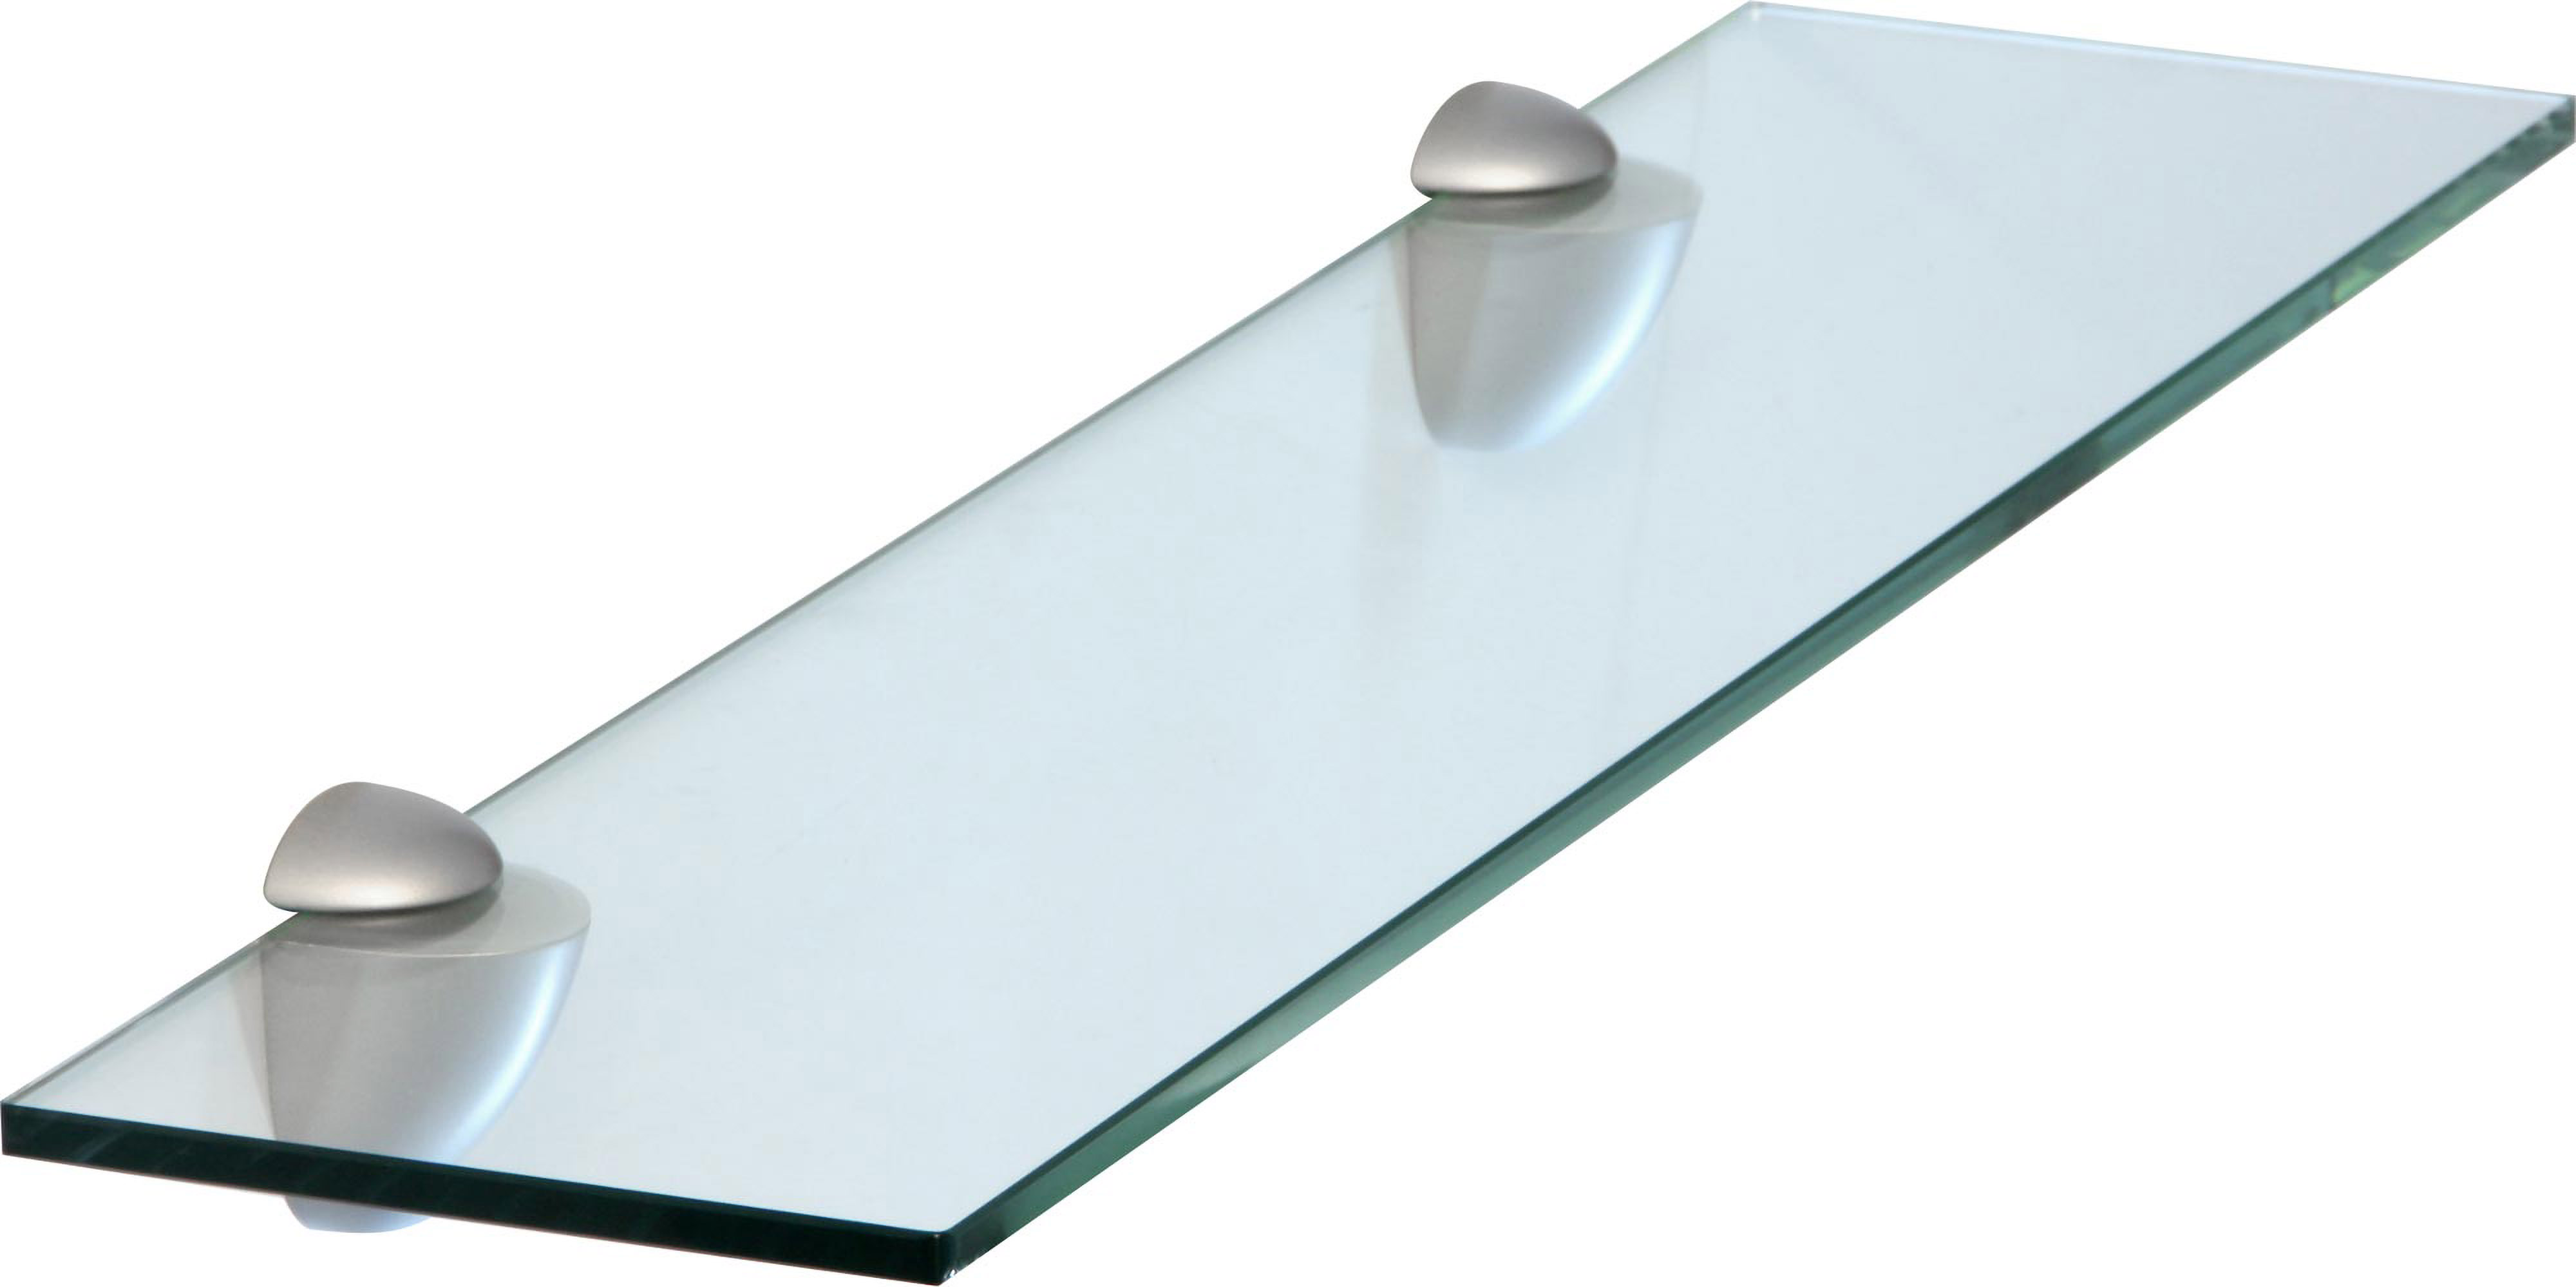 tag re murale en verre 8 mm clair et satin 9. Black Bedroom Furniture Sets. Home Design Ideas